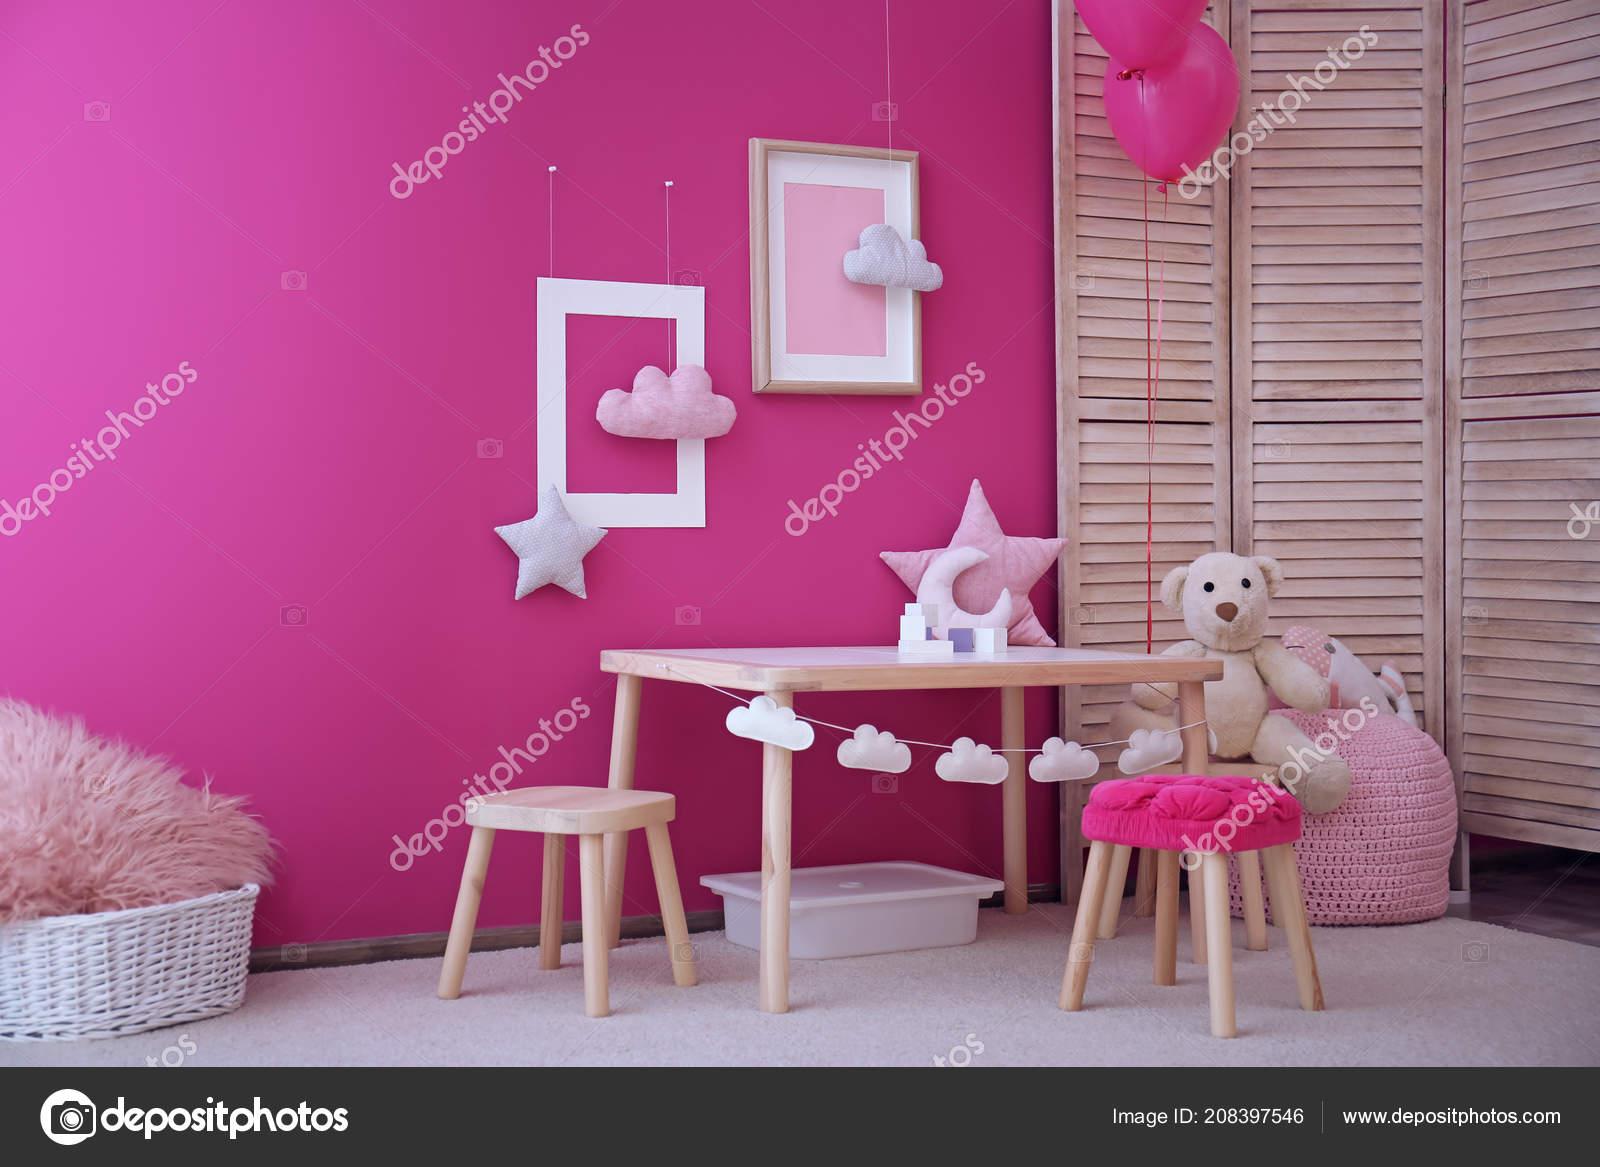 Modern Interior Child Game Room Table Chairs Toys Stock Photo C Liudmilachernetska Gmail Com 208397546